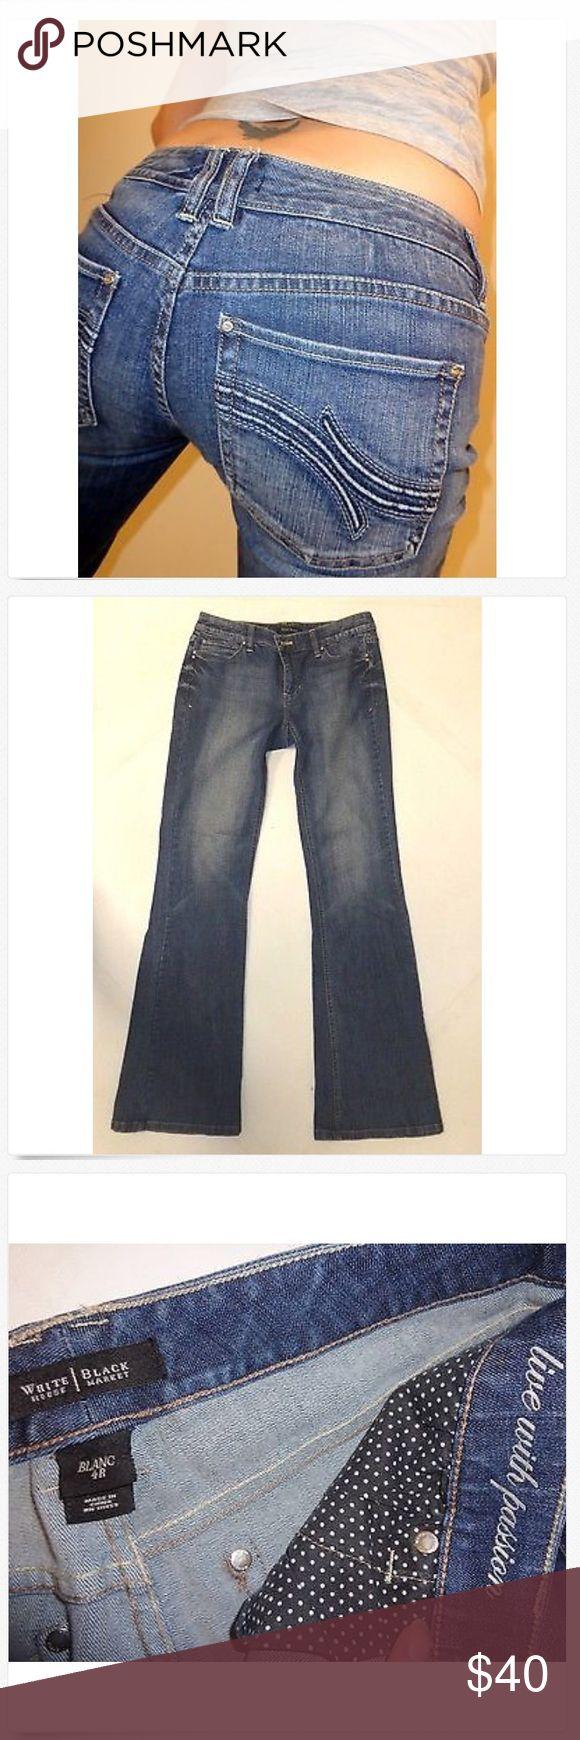 White House Black Market Flare Leg Jeans! 4 x 33 Gorgeous White House Black Market Mid Rise Stretch Flare Leg Jeans! 4R x 33 Long! Great Used!  15 across & 8 rise, 99% cotton & 1% spandex White House Black Market Jeans Flare & Wide Leg